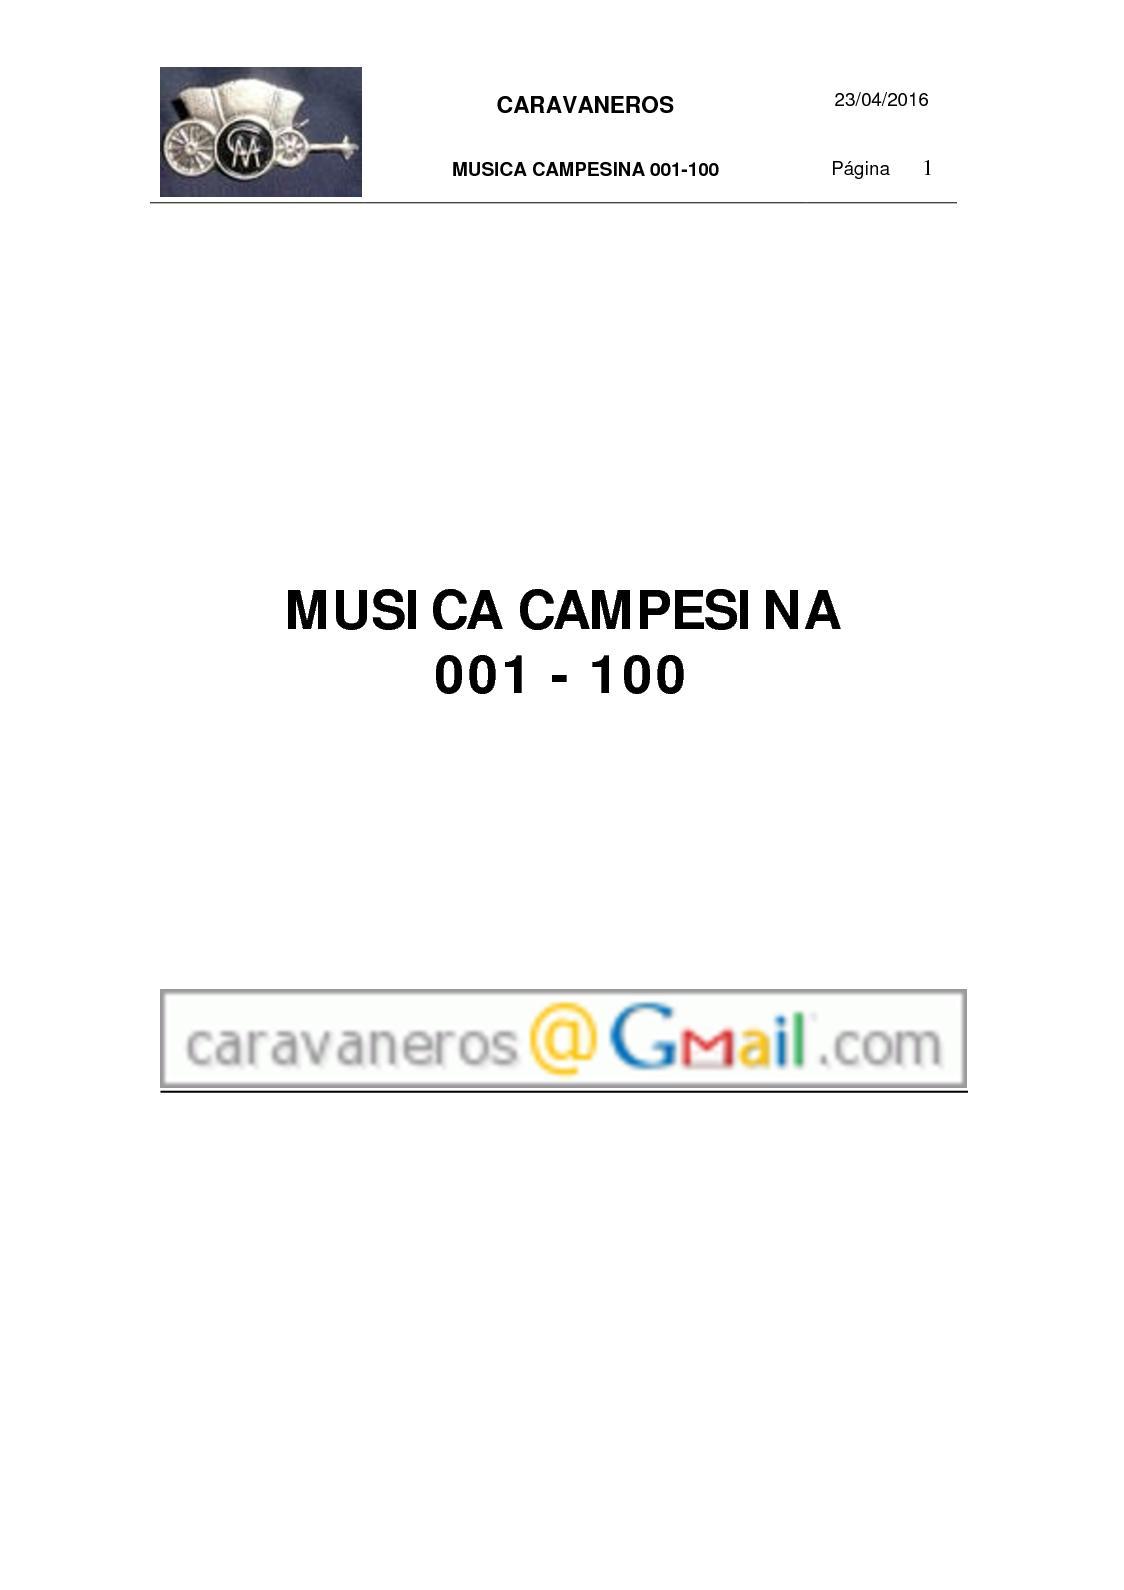 Calaméo - Caravaneros Memoria 10 01 Música Campesina 001 100 e6d3500adcf